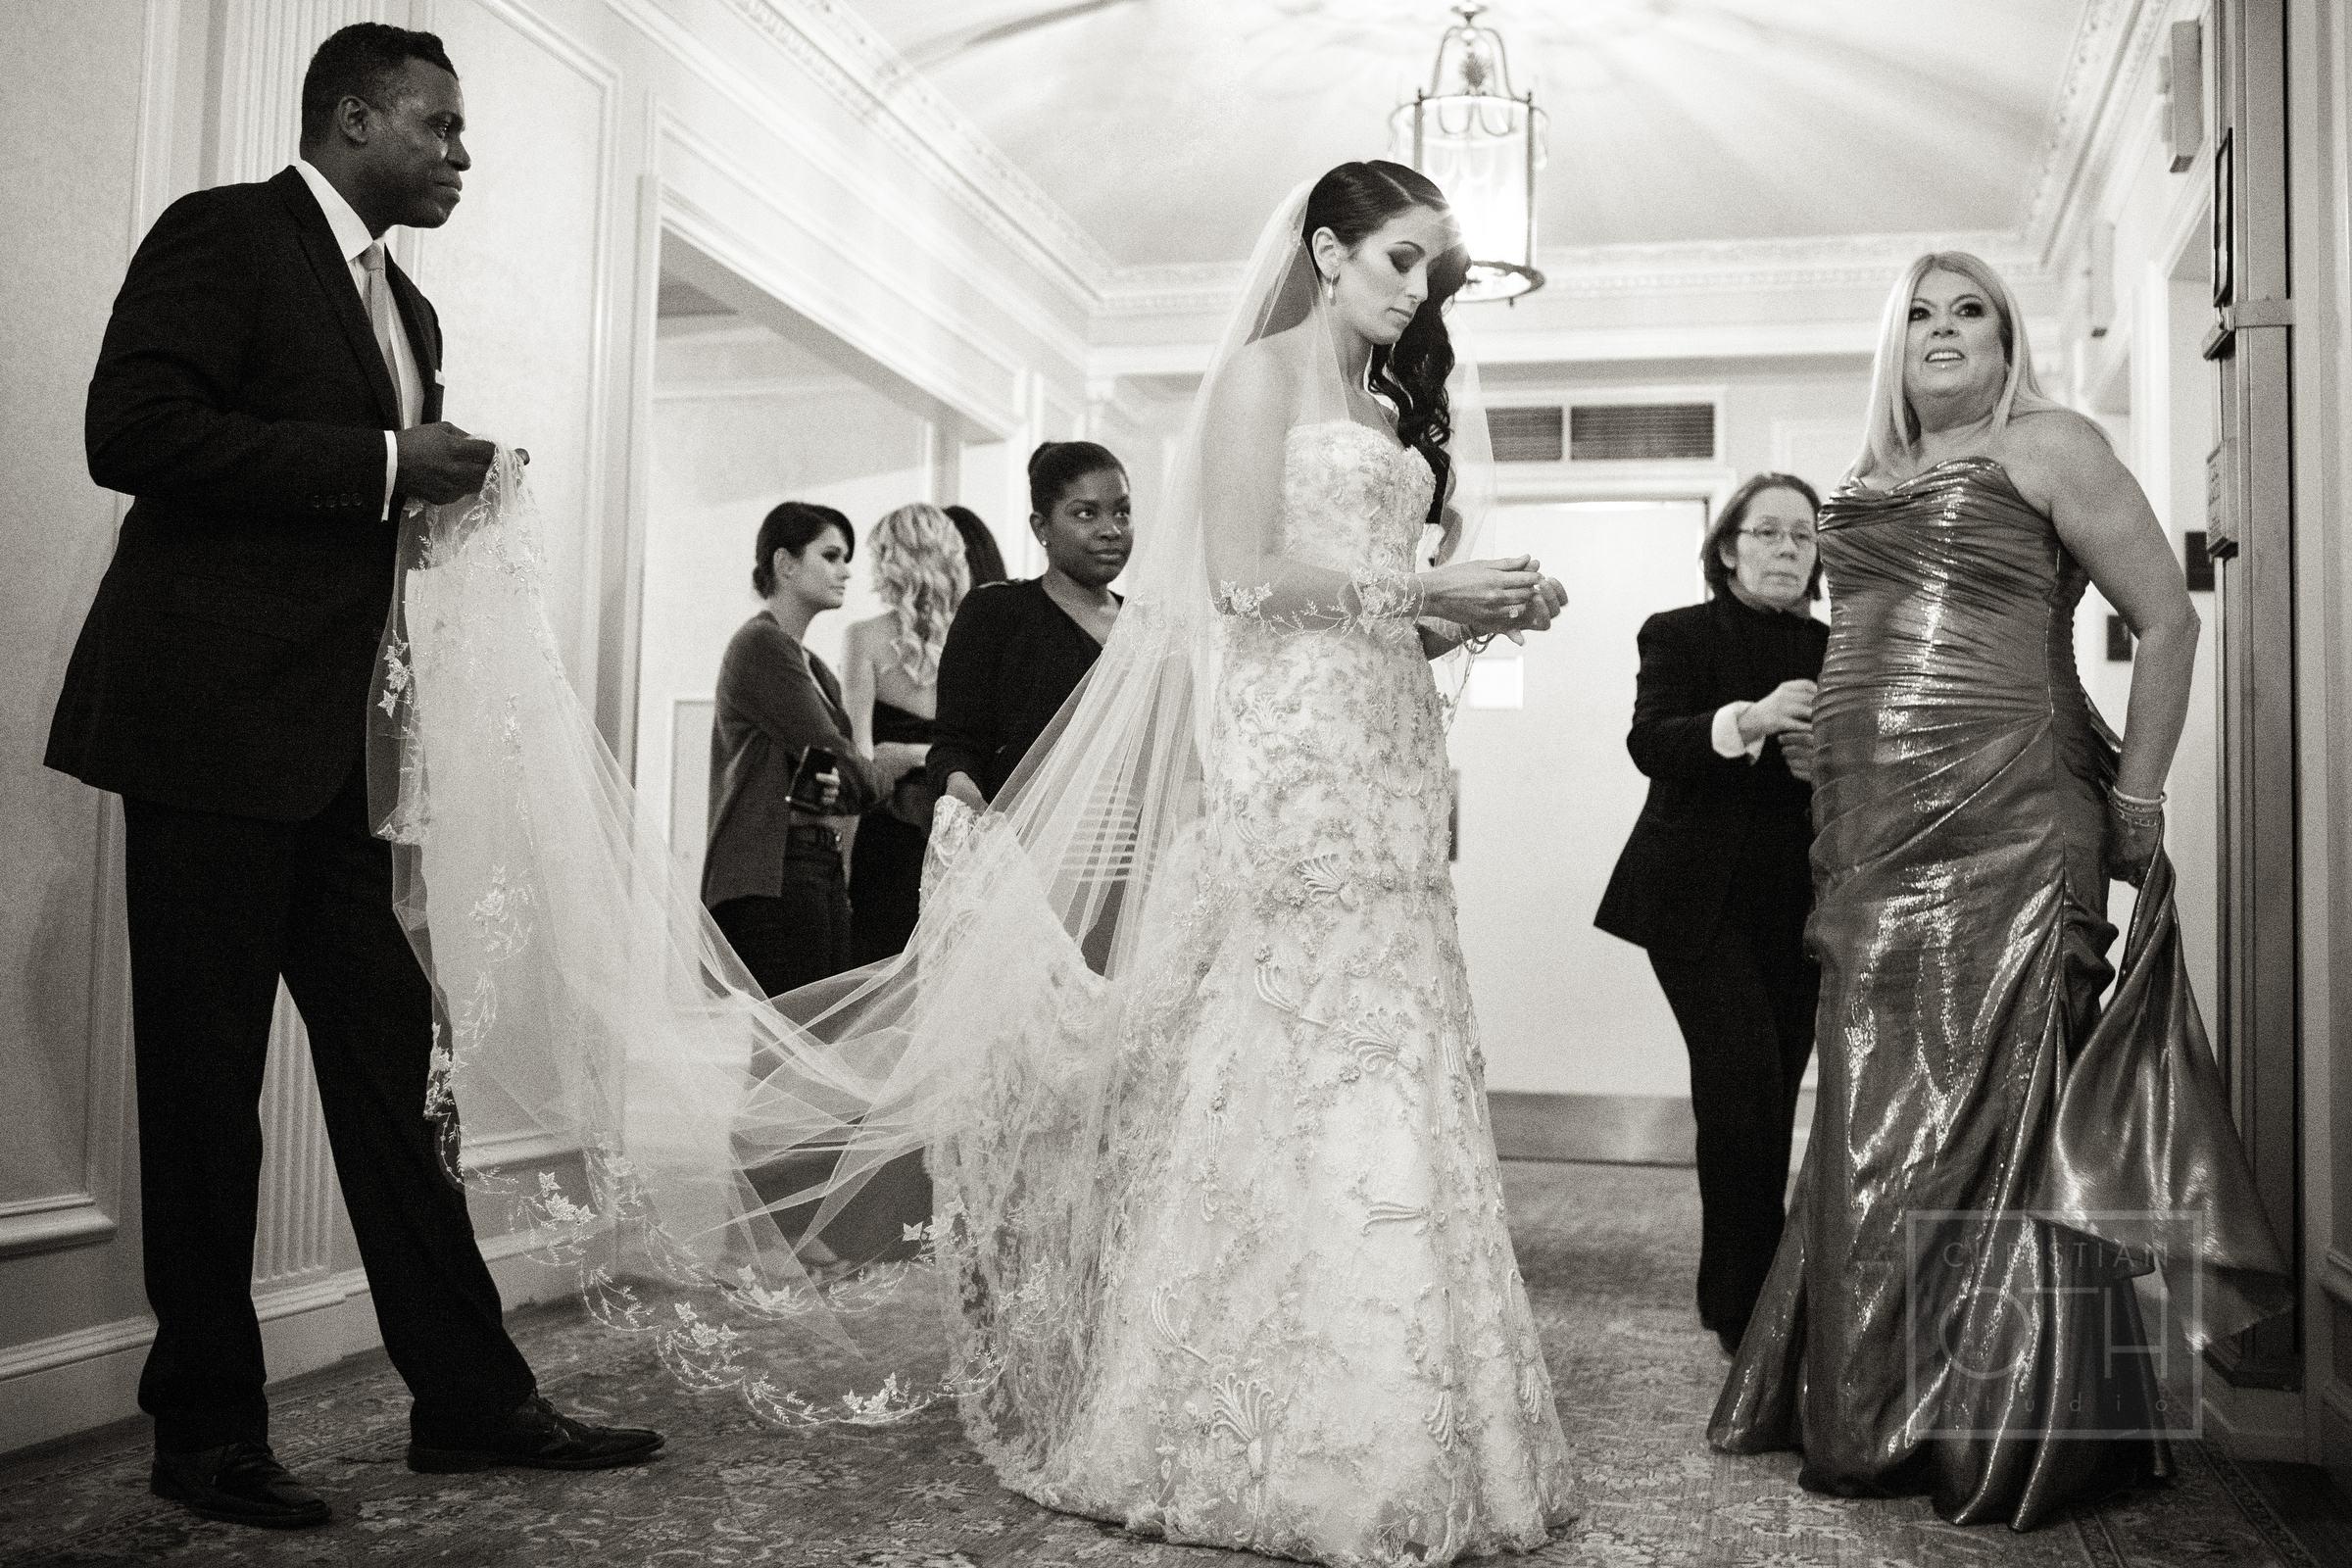 Ceci_New_York_Custom_Invitation_Pierre__City_ Destination_Wedding_Luxury_Personalized_Ceci_Style_Bride_Rose_Gold_Foil_Stamping86.JPG